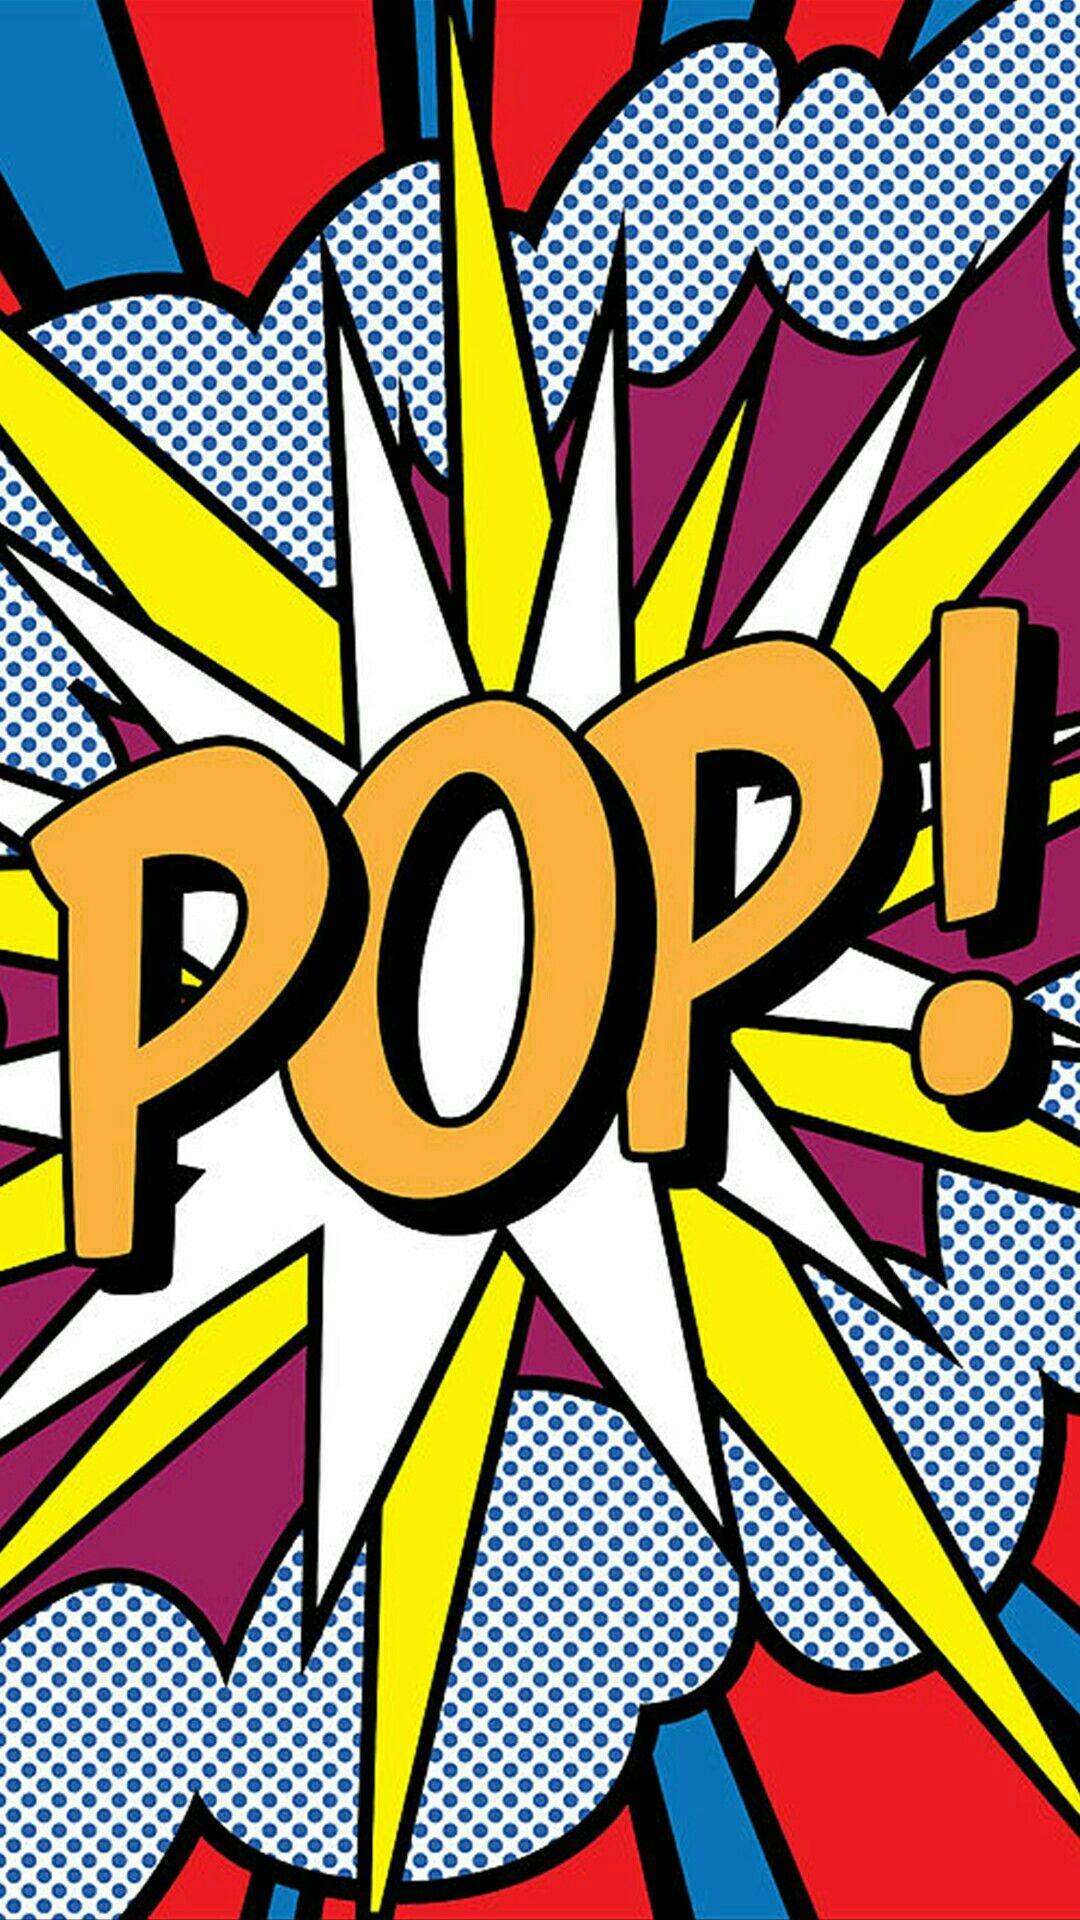 Pop art wallpaper image by Indigo Sunshine on POP Retro